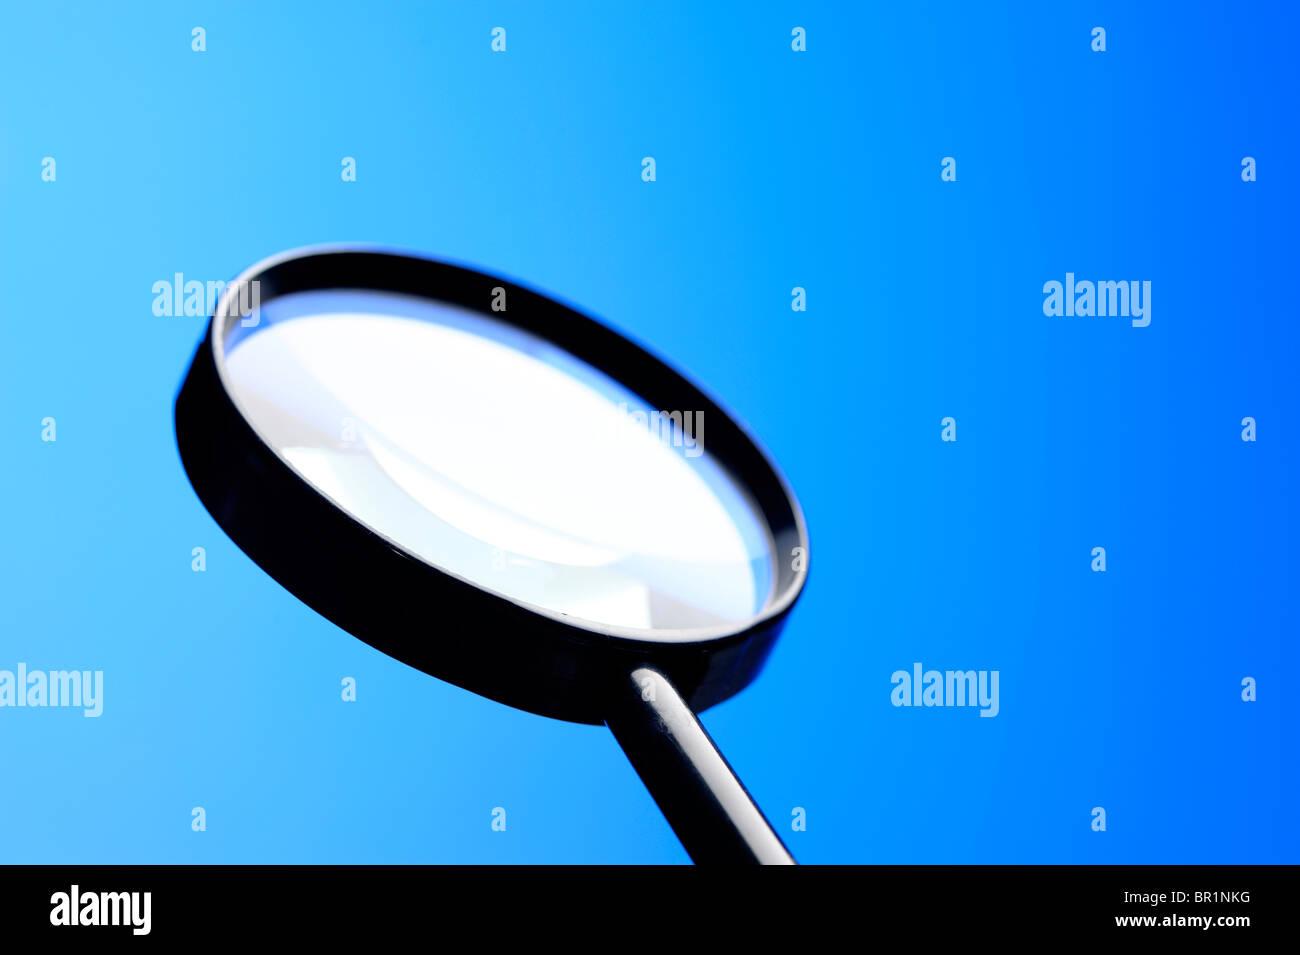 Lupe-Objektiv Stockbild